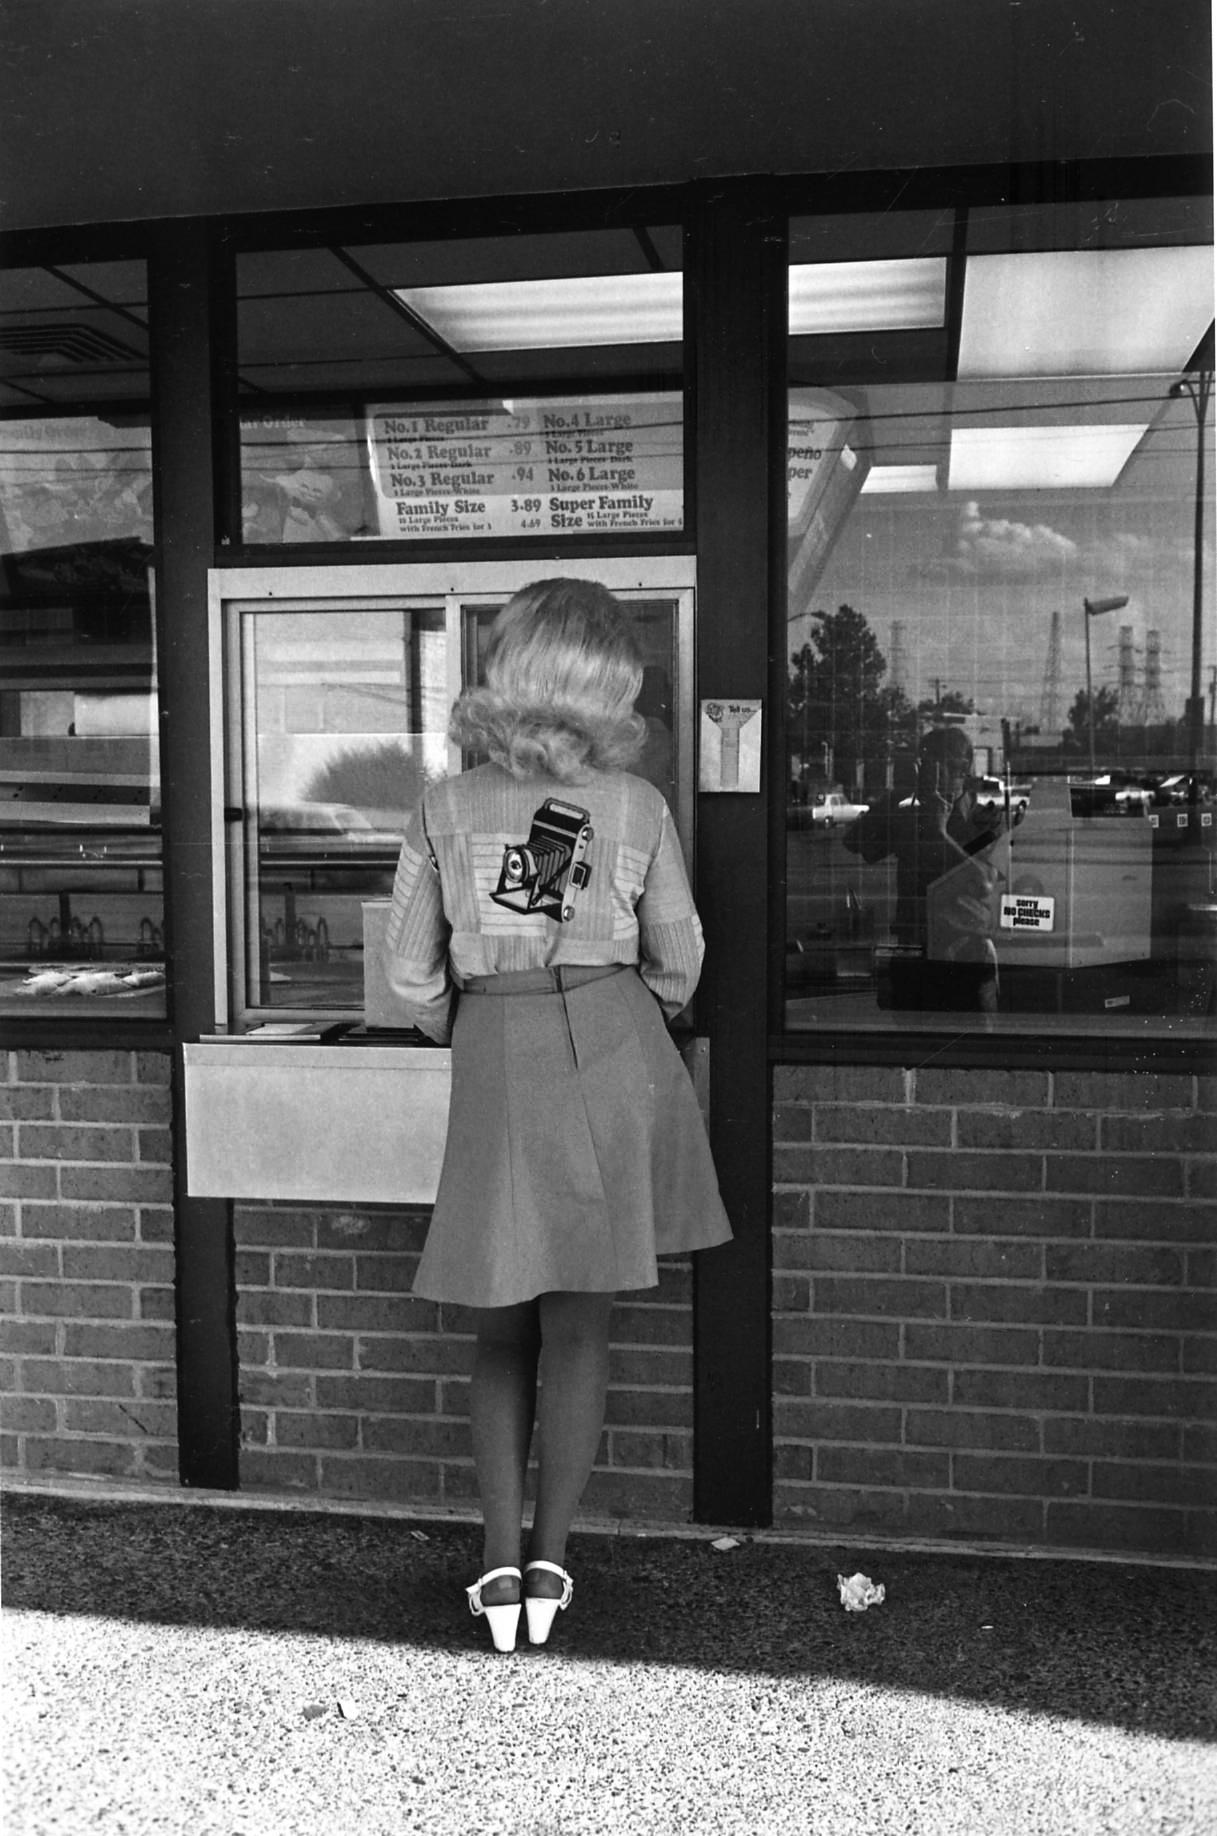 dallas, texas, 1975 • lee friedlander